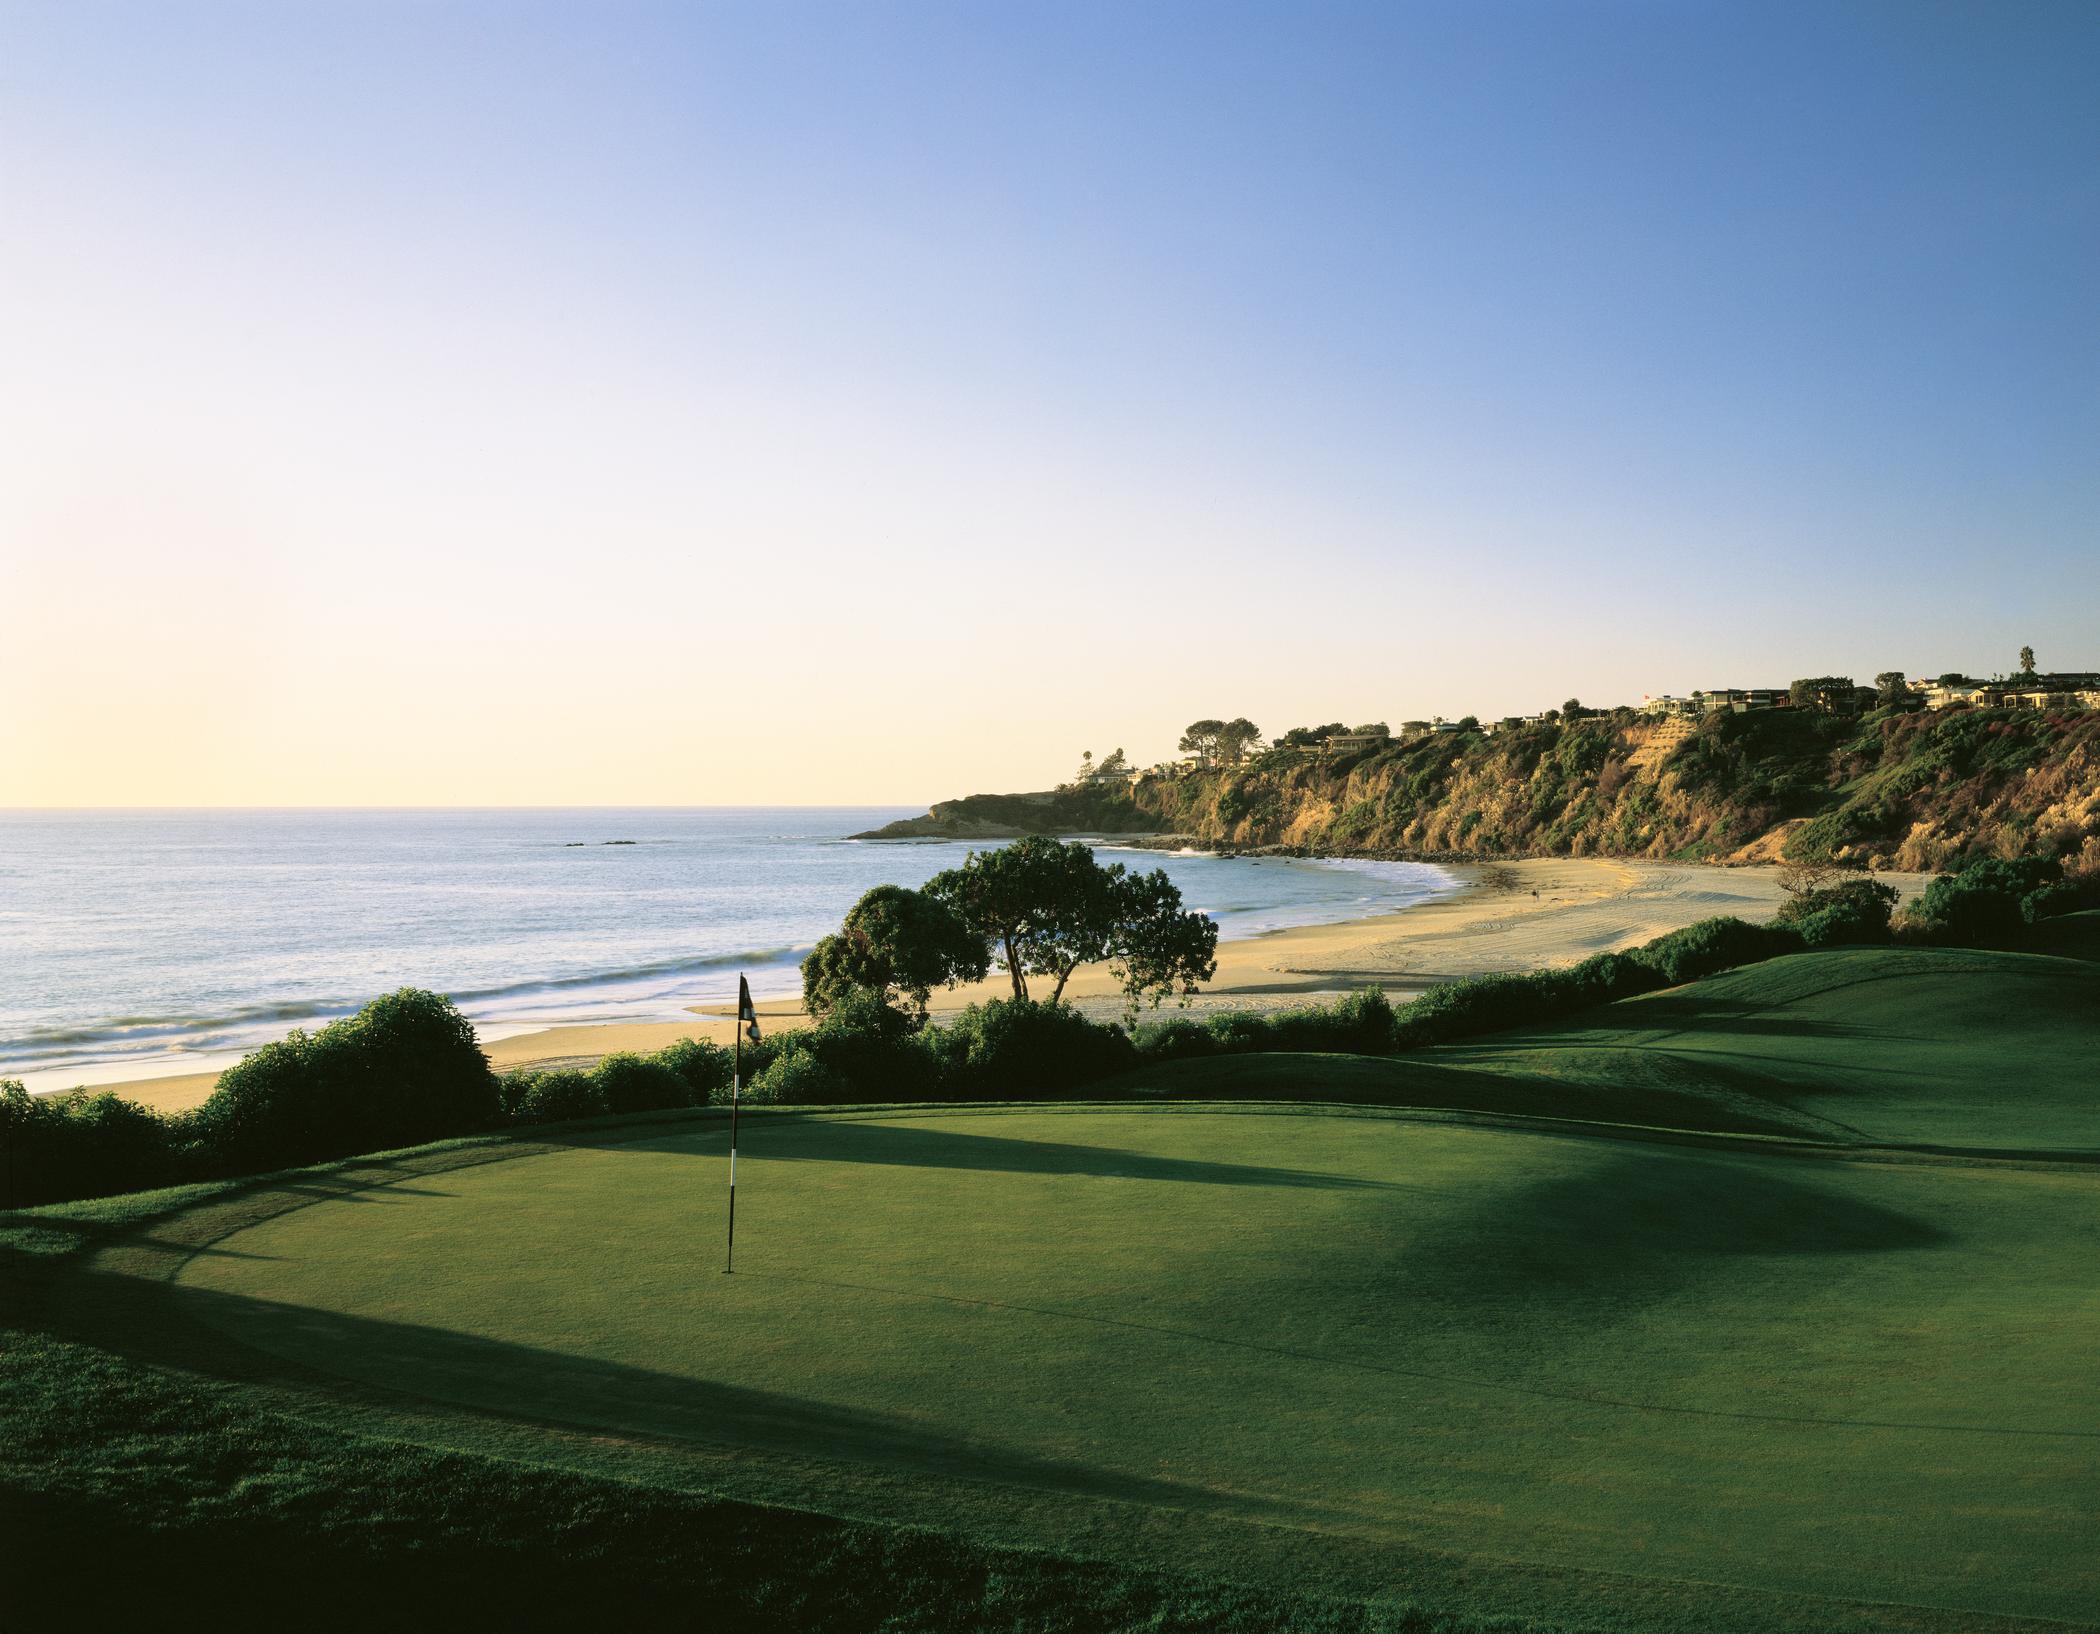 Monarch Beach Resort Golf Links hole next to the beach.